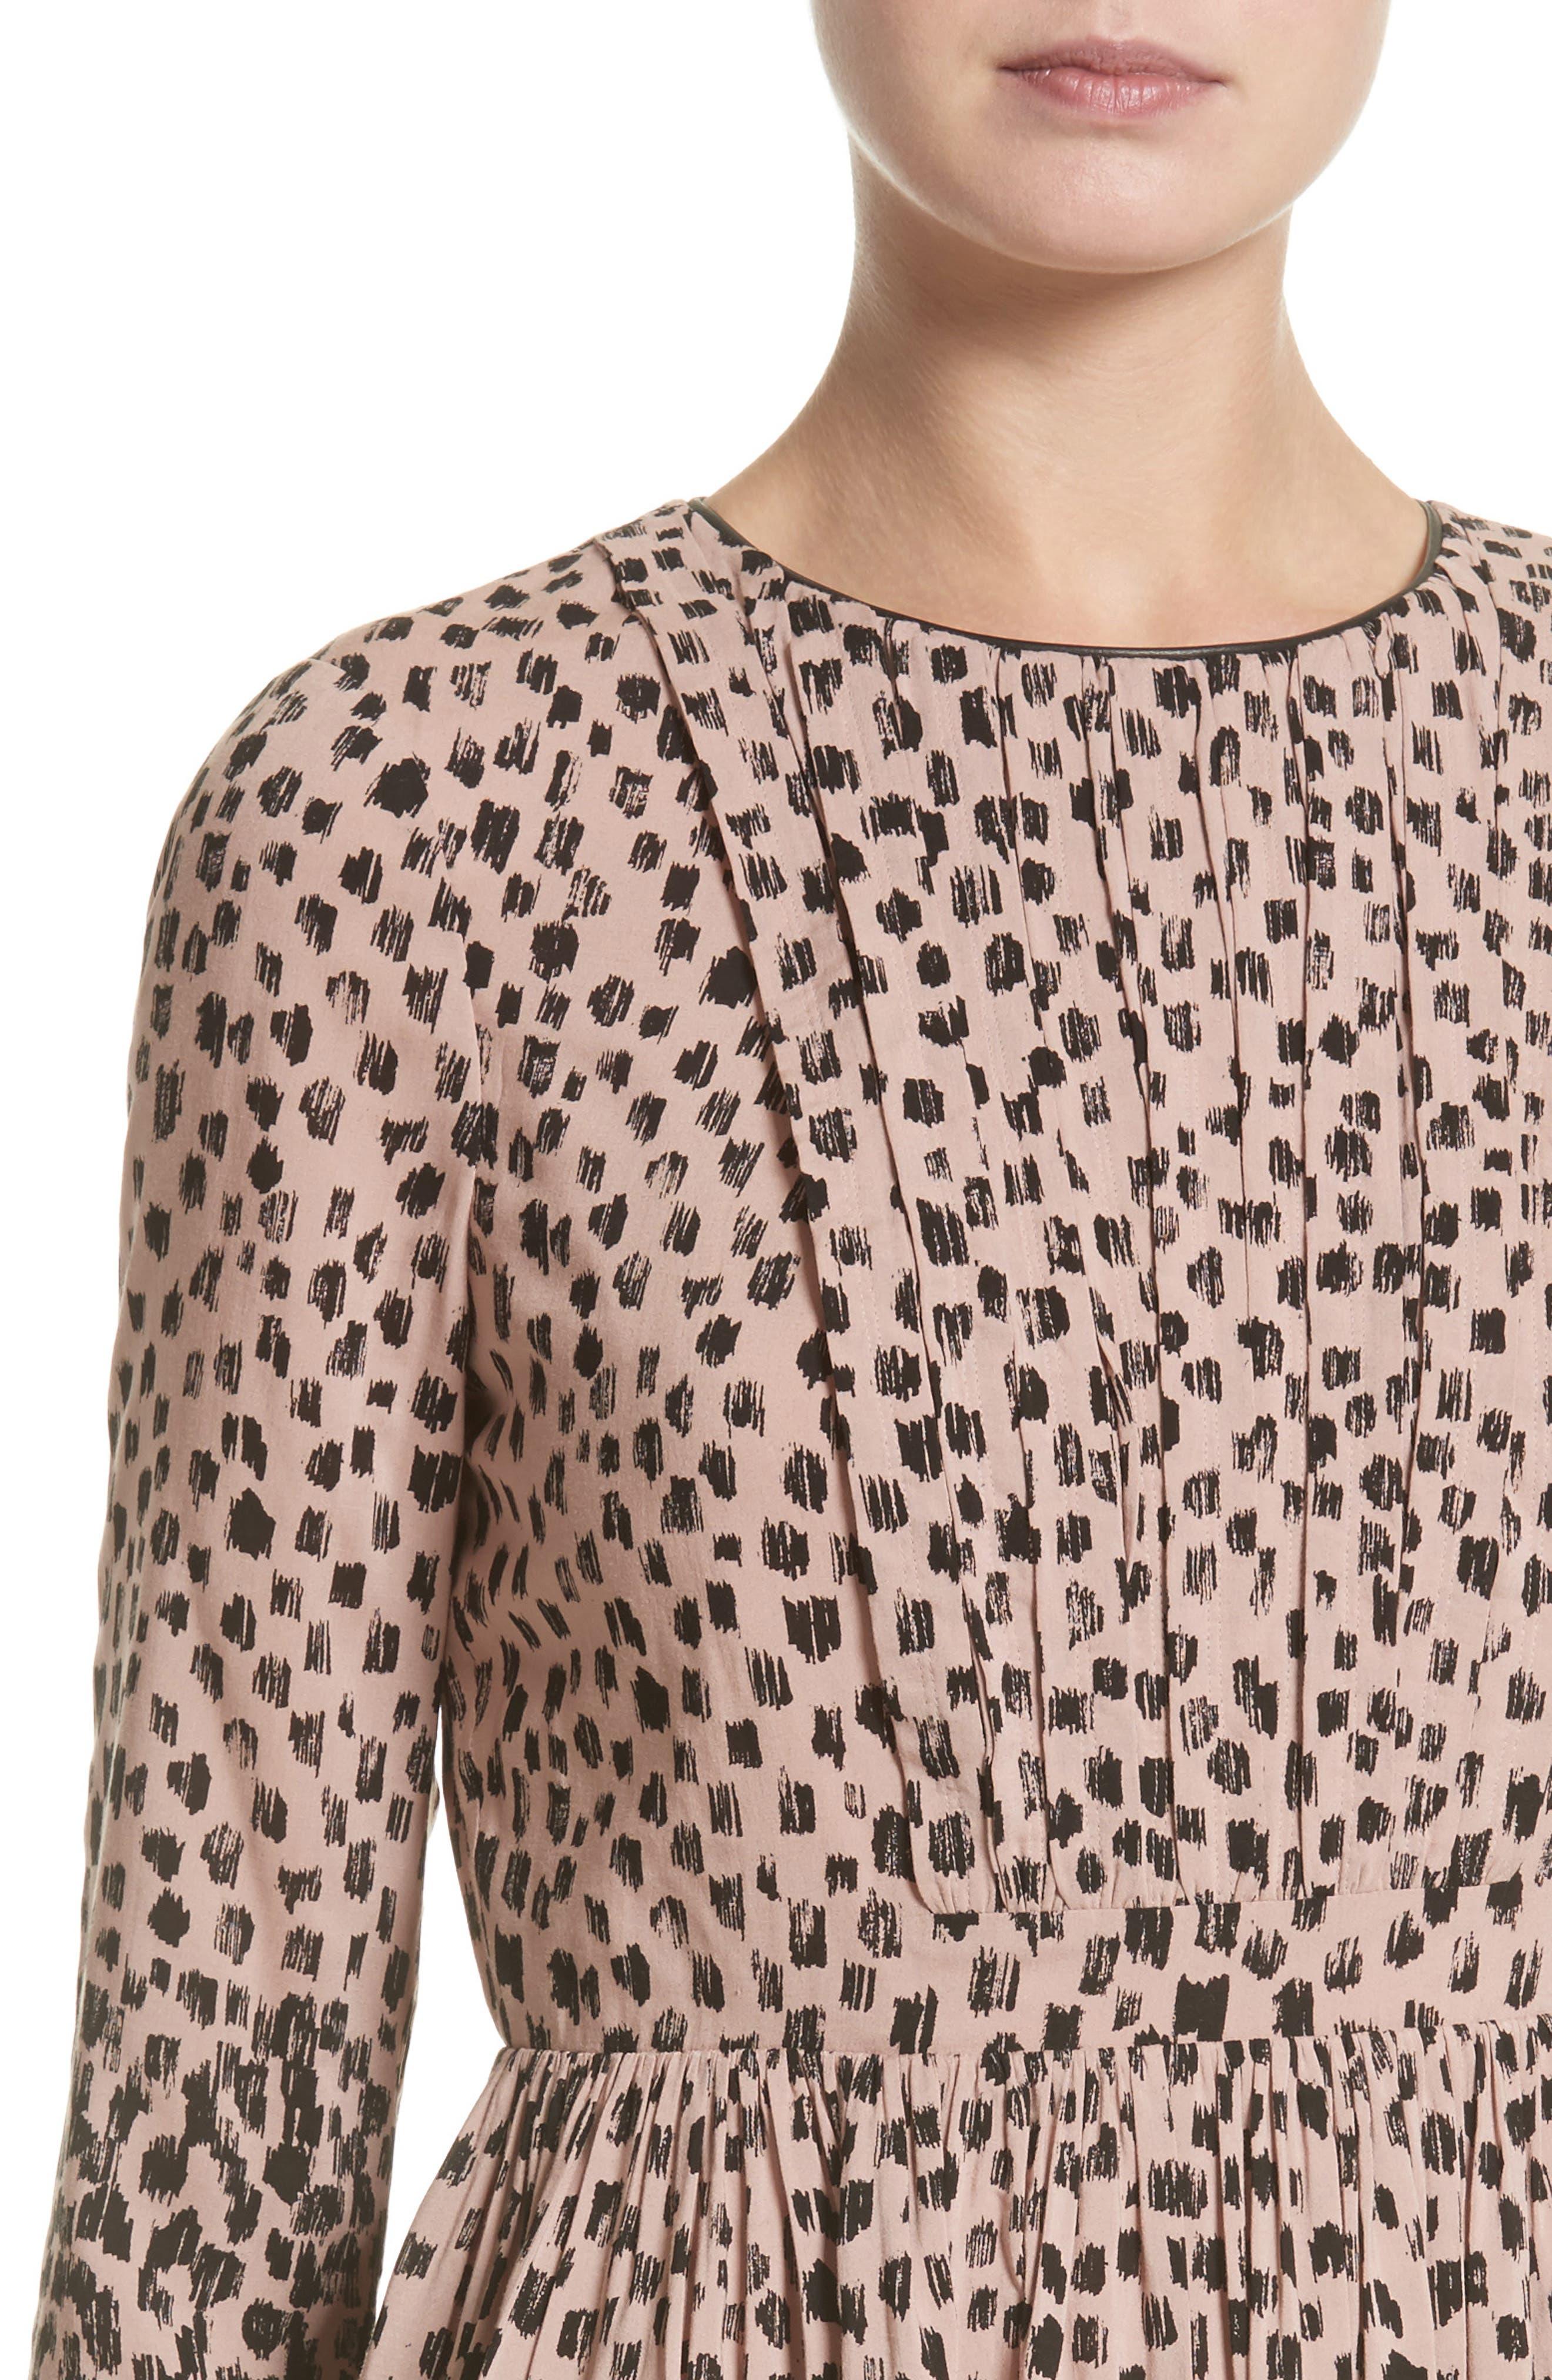 Karinkalt Leather Trim Print Dress,                             Alternate thumbnail 6, color,                             Pale Pink